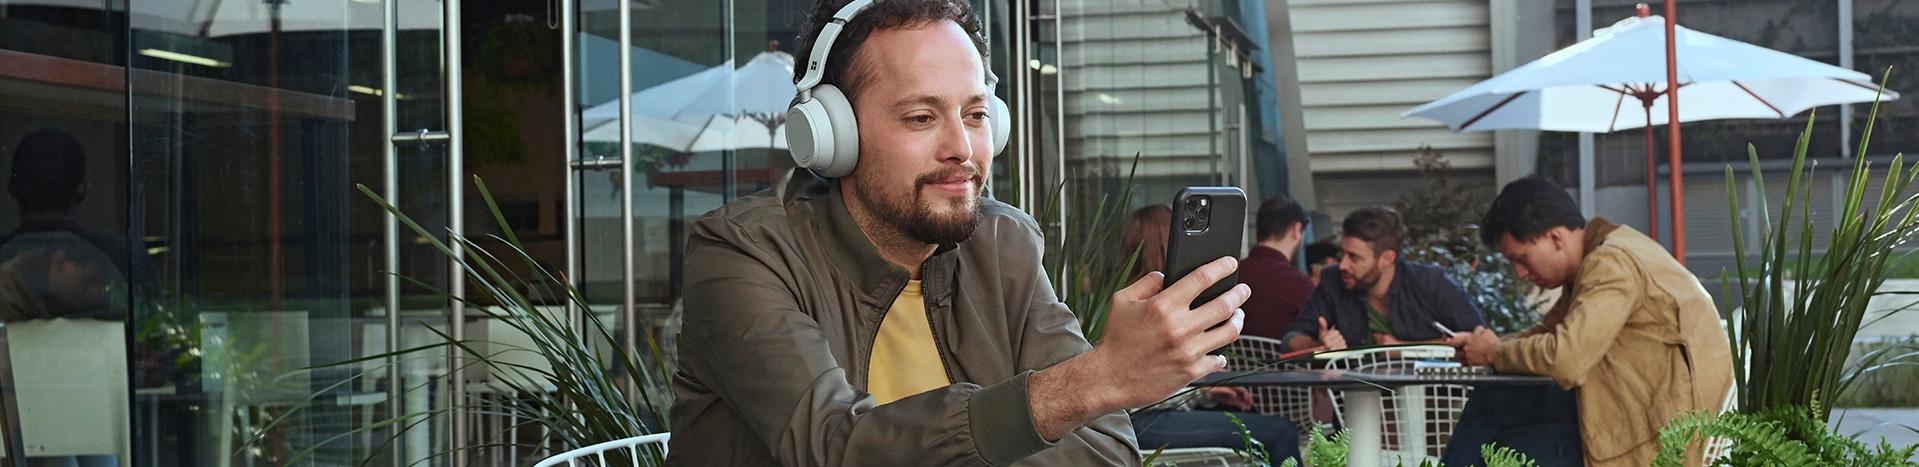 Personne avec un casque audio regardant un smartphone.